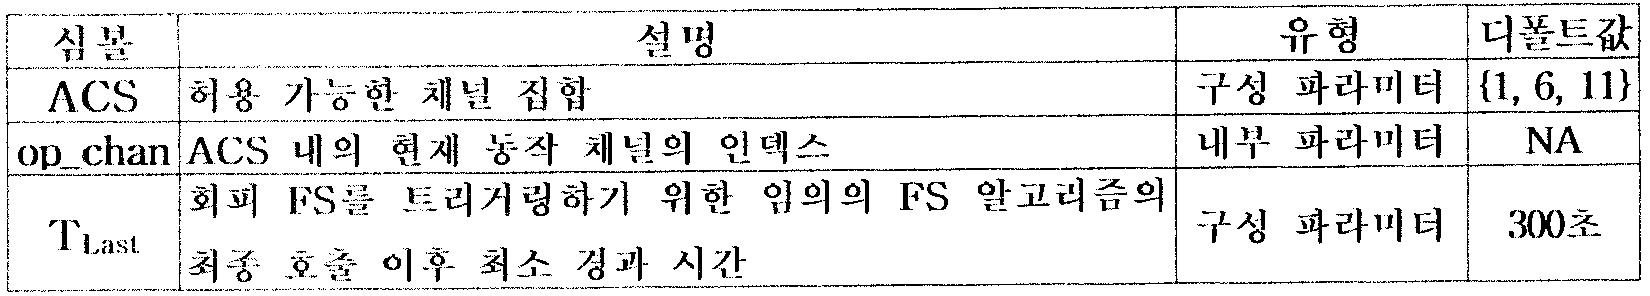 Figure 112005001067407-pat00001